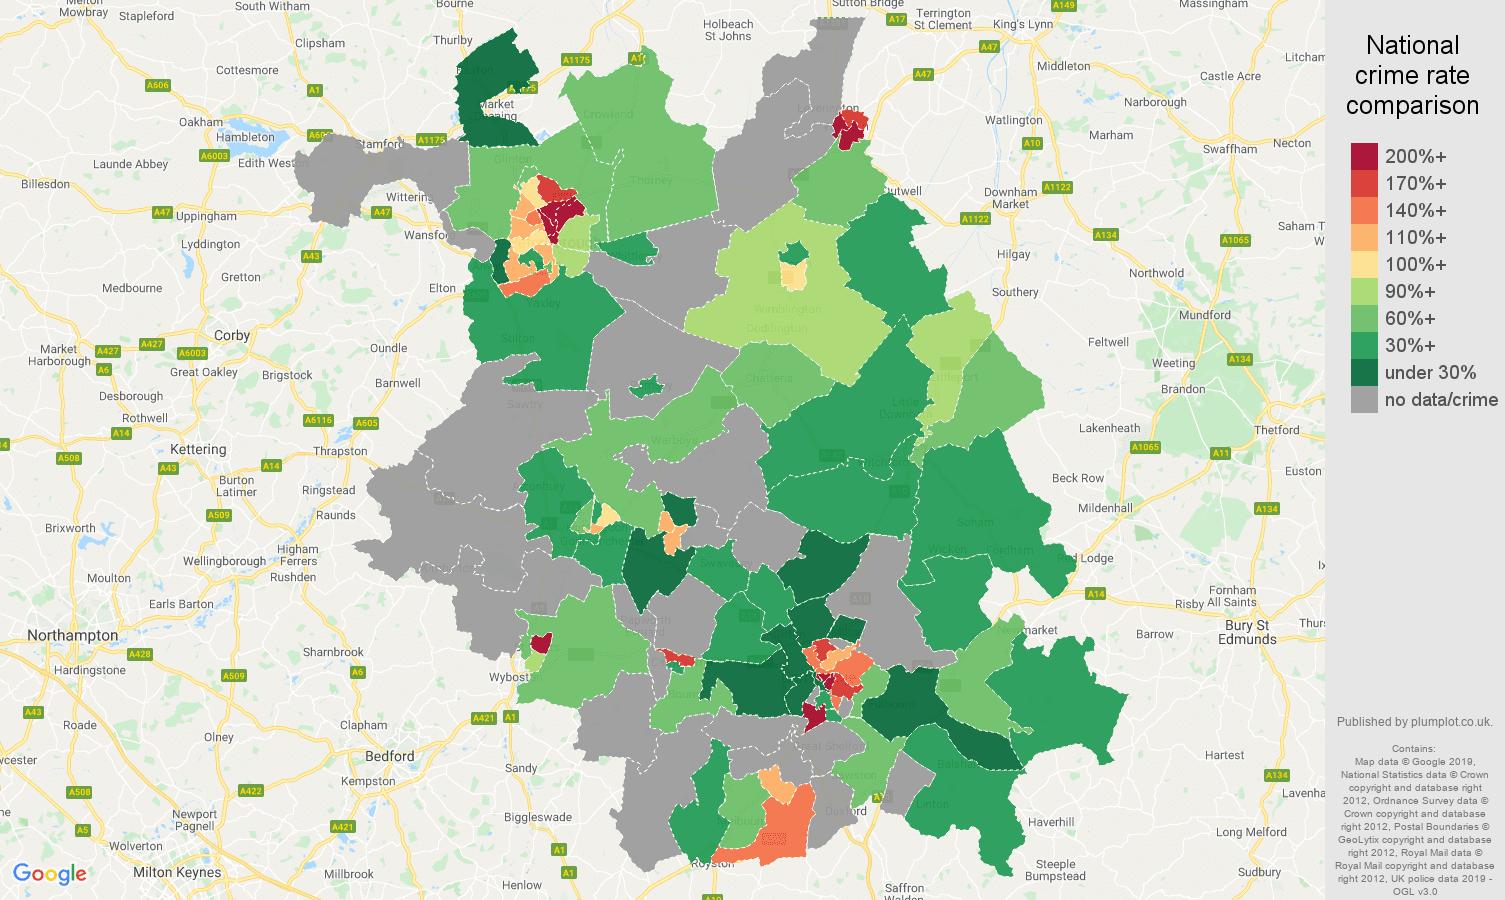 Cambridgeshire possession of weapons crime rate comparison map